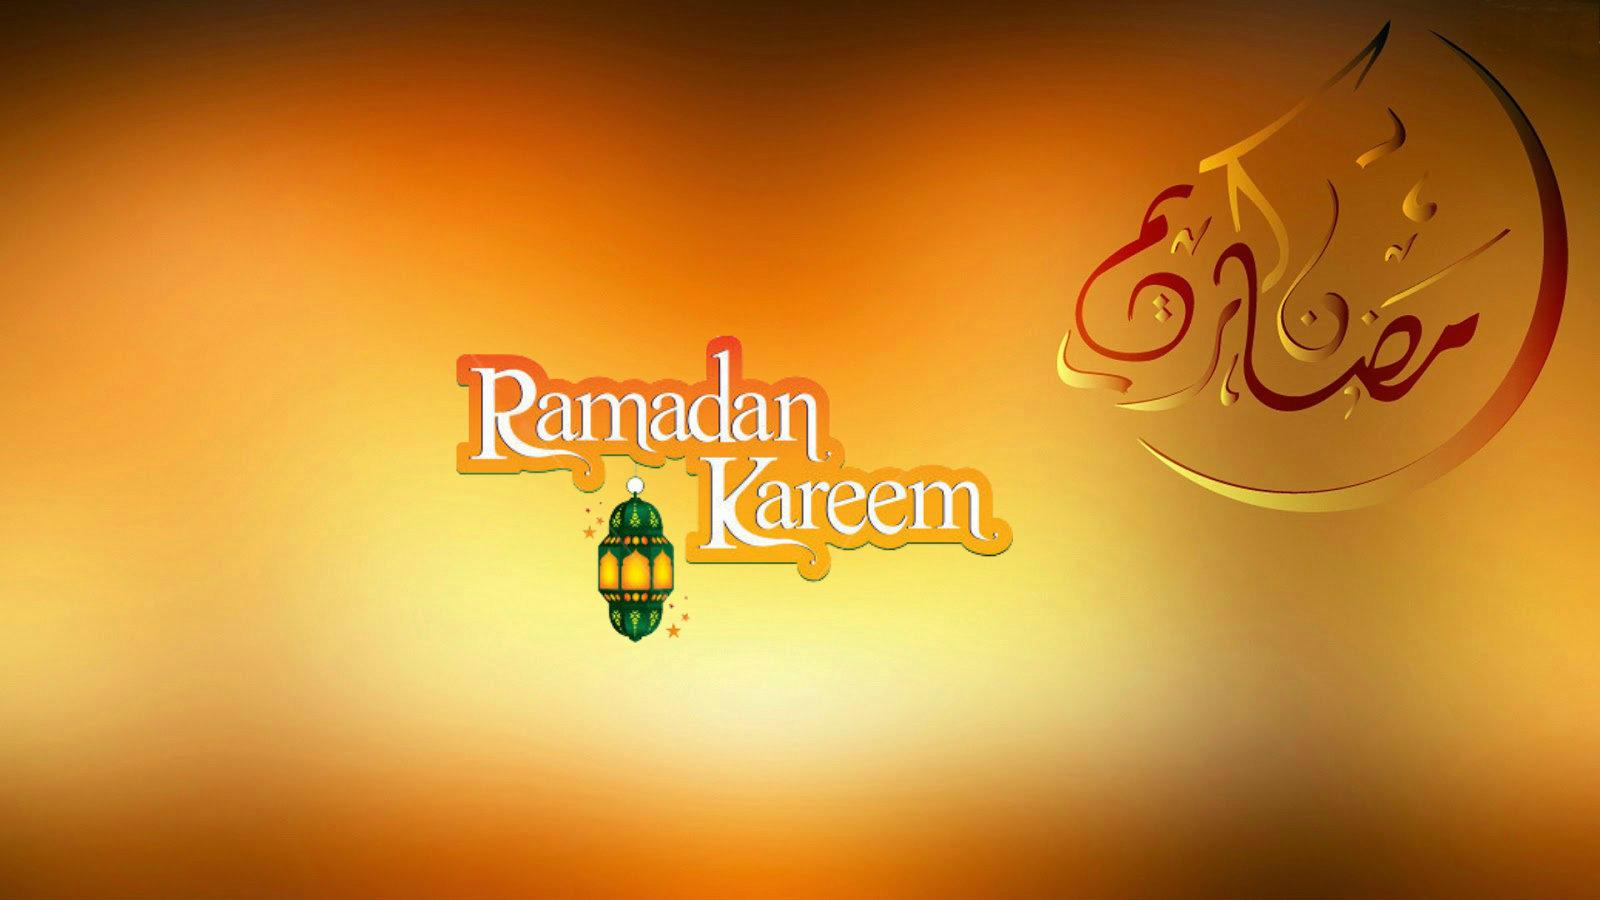 بالصور صور رمضان كريم , خلفيات لشهر الصيام 1543 8